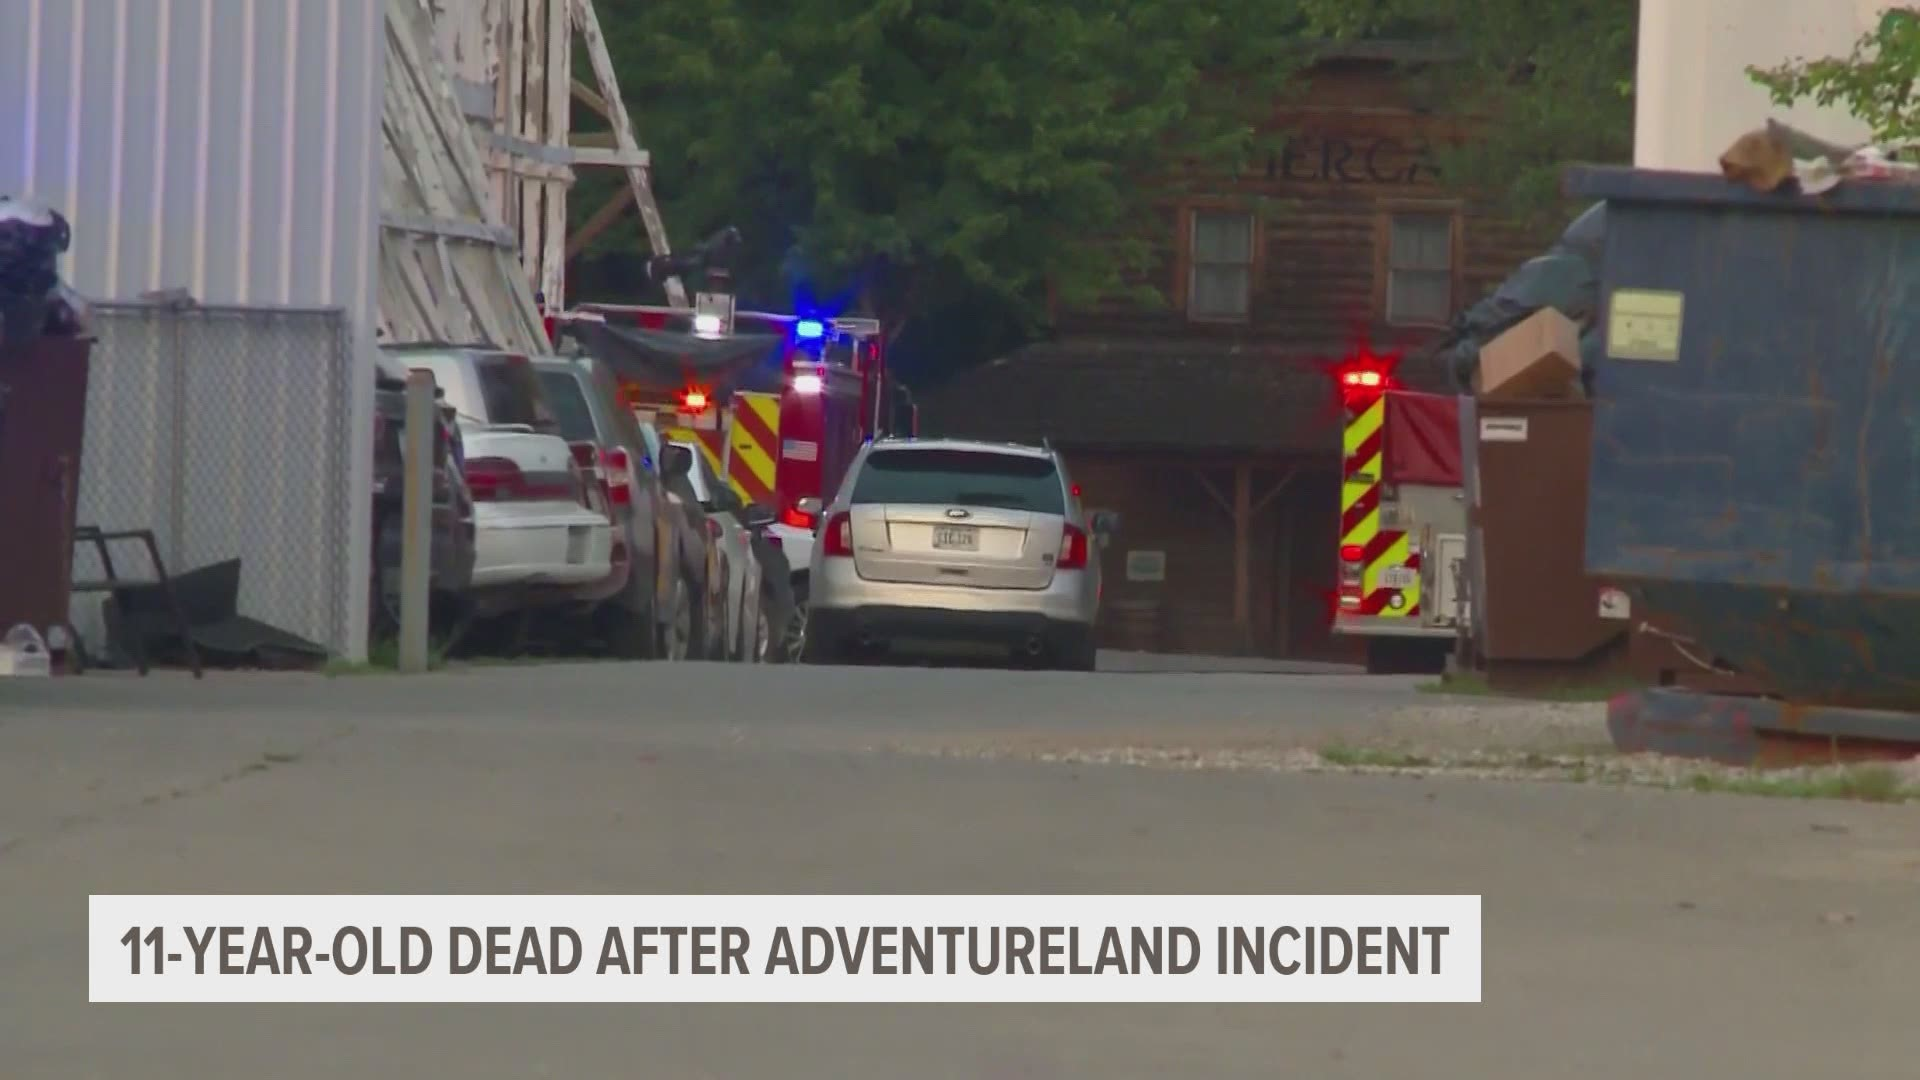 Adventureland Park Accident 11 Year Old Killed On Raging River Weareiowa Com